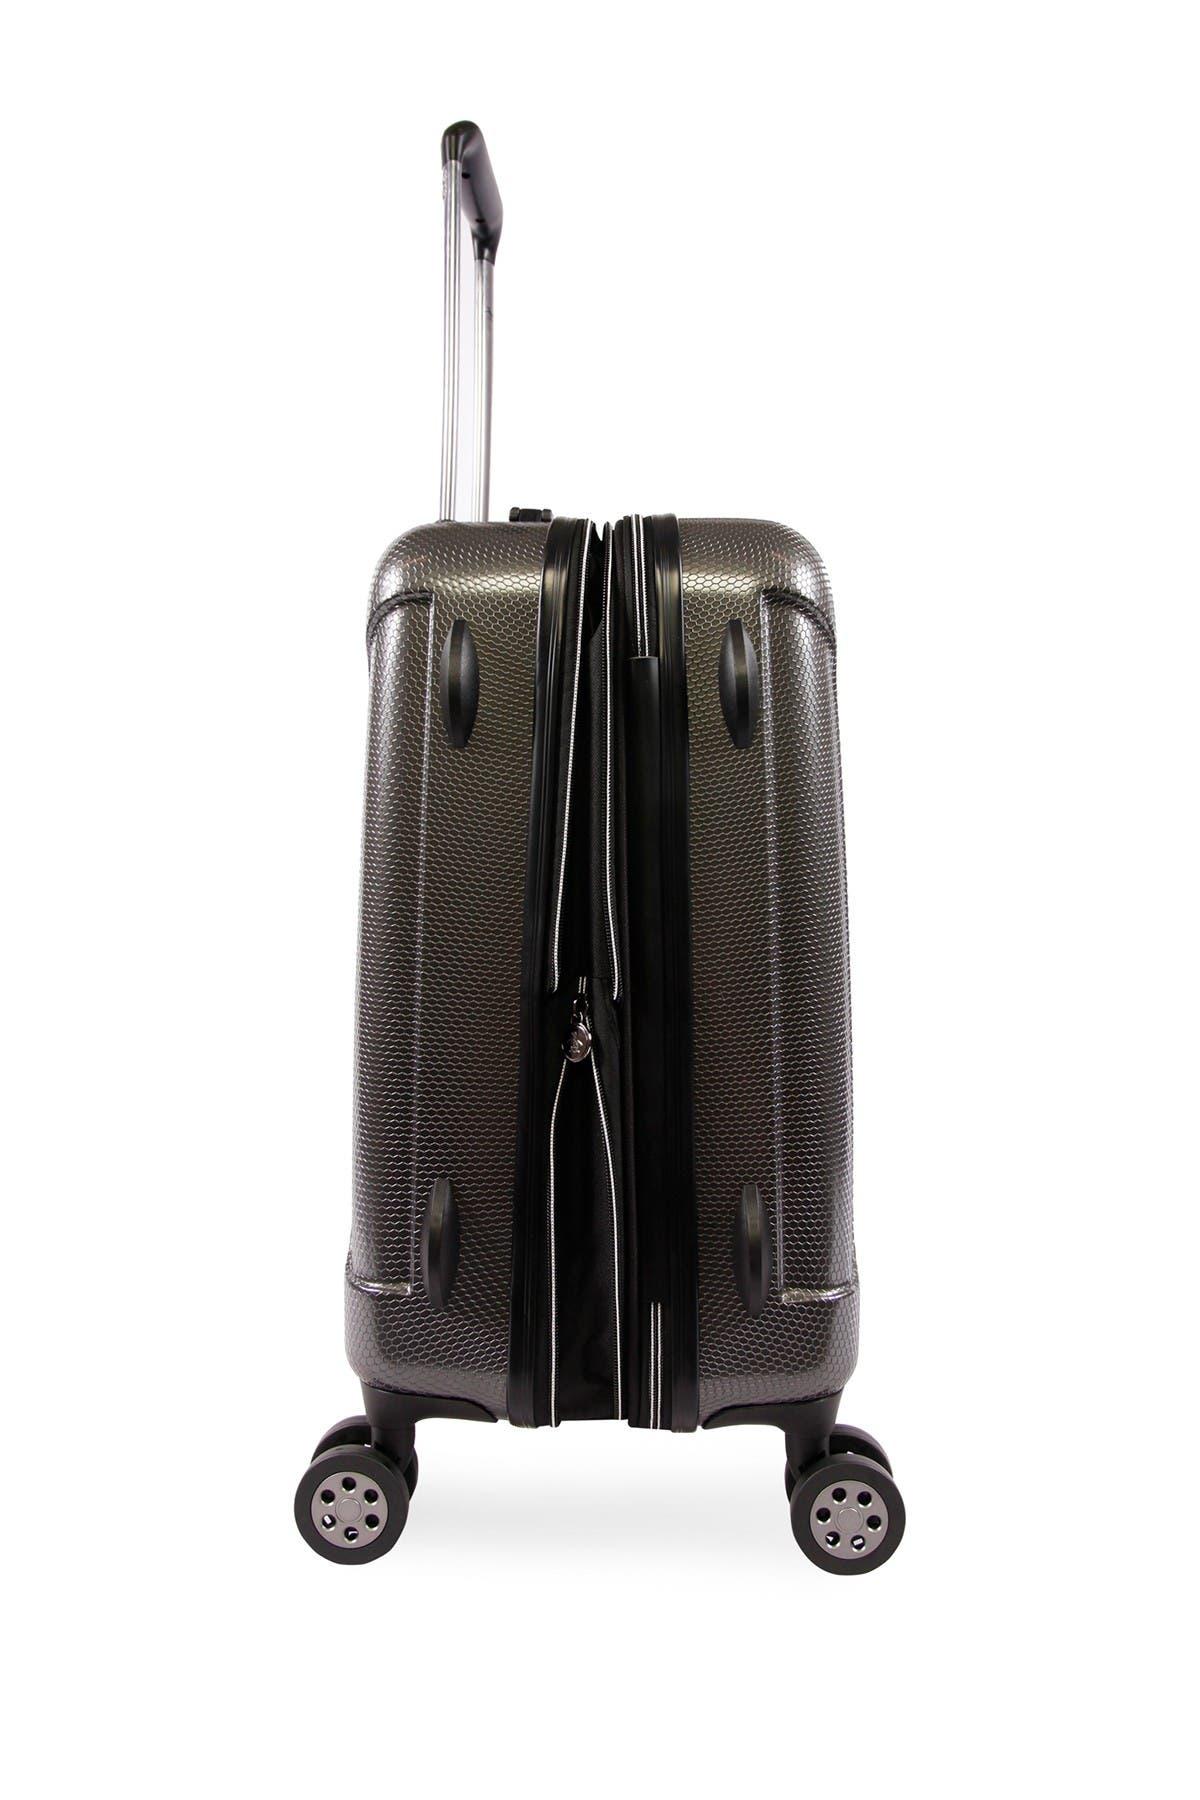 "Original Penguin Crest 21"" Expandable Hardside Carry-On Spinner"